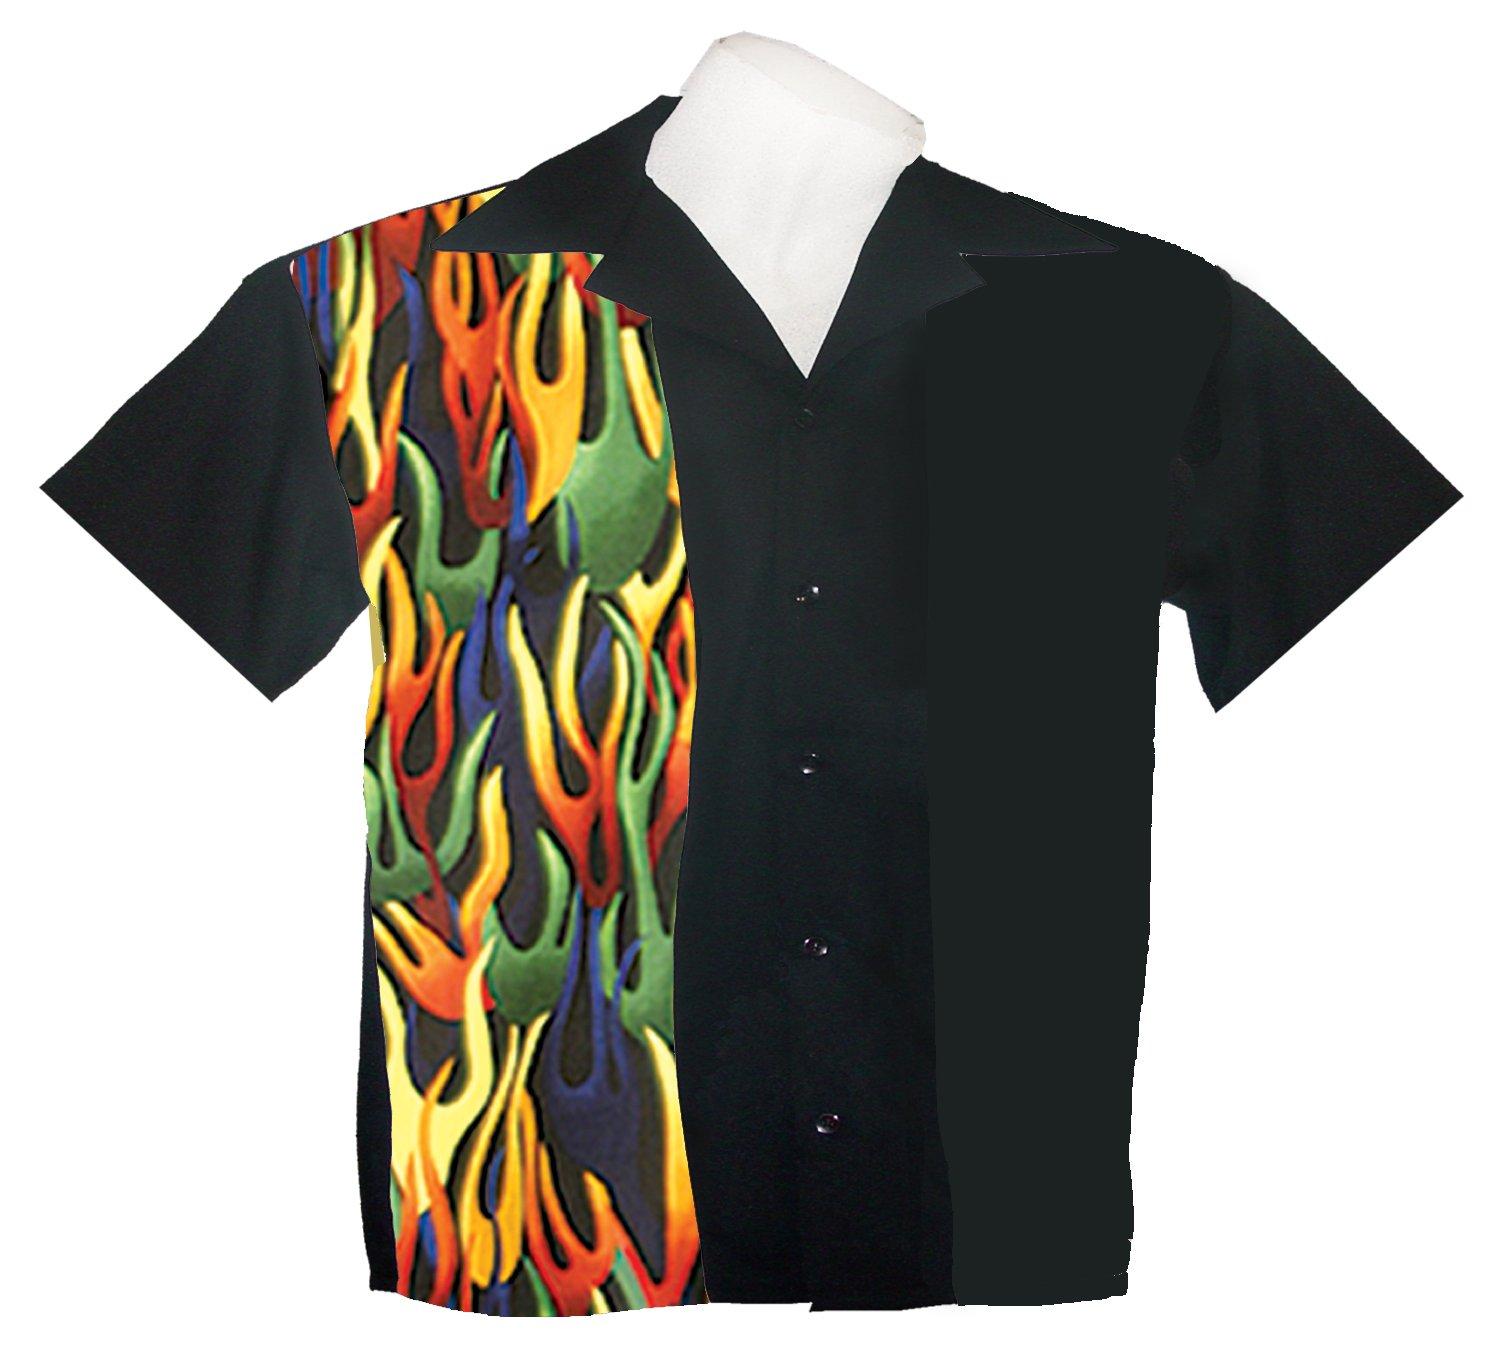 Tutti Boys Bowling Shirts Children Sizes Small 2T-3T Yrs, Medium 4-5 Yrs, Large 6-7 Yrs (Small 2T-3T Yrs) by Tutti